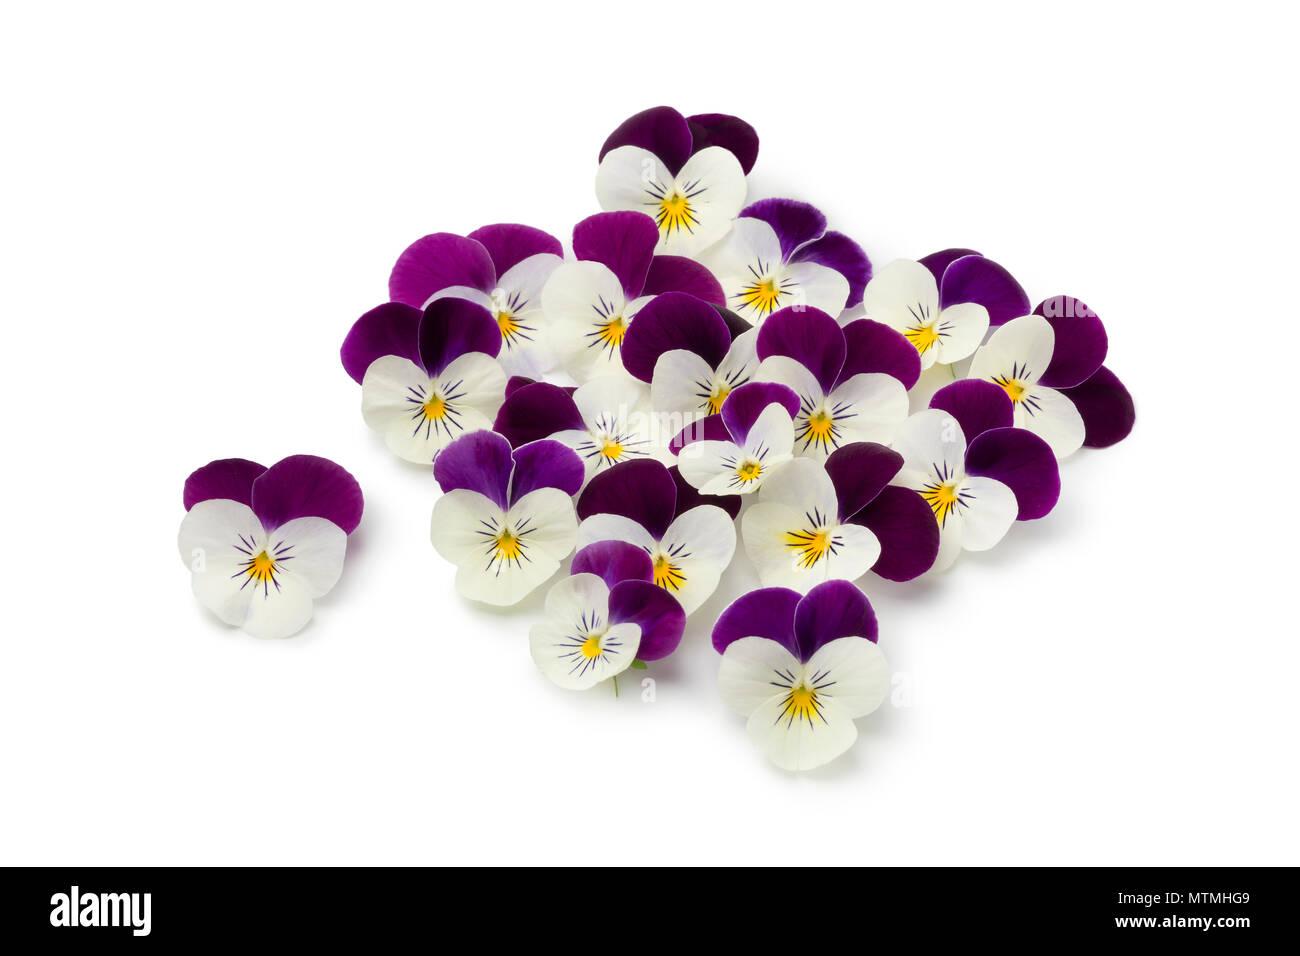 Fresh picked viola flowers isolated on white background - Stock Image